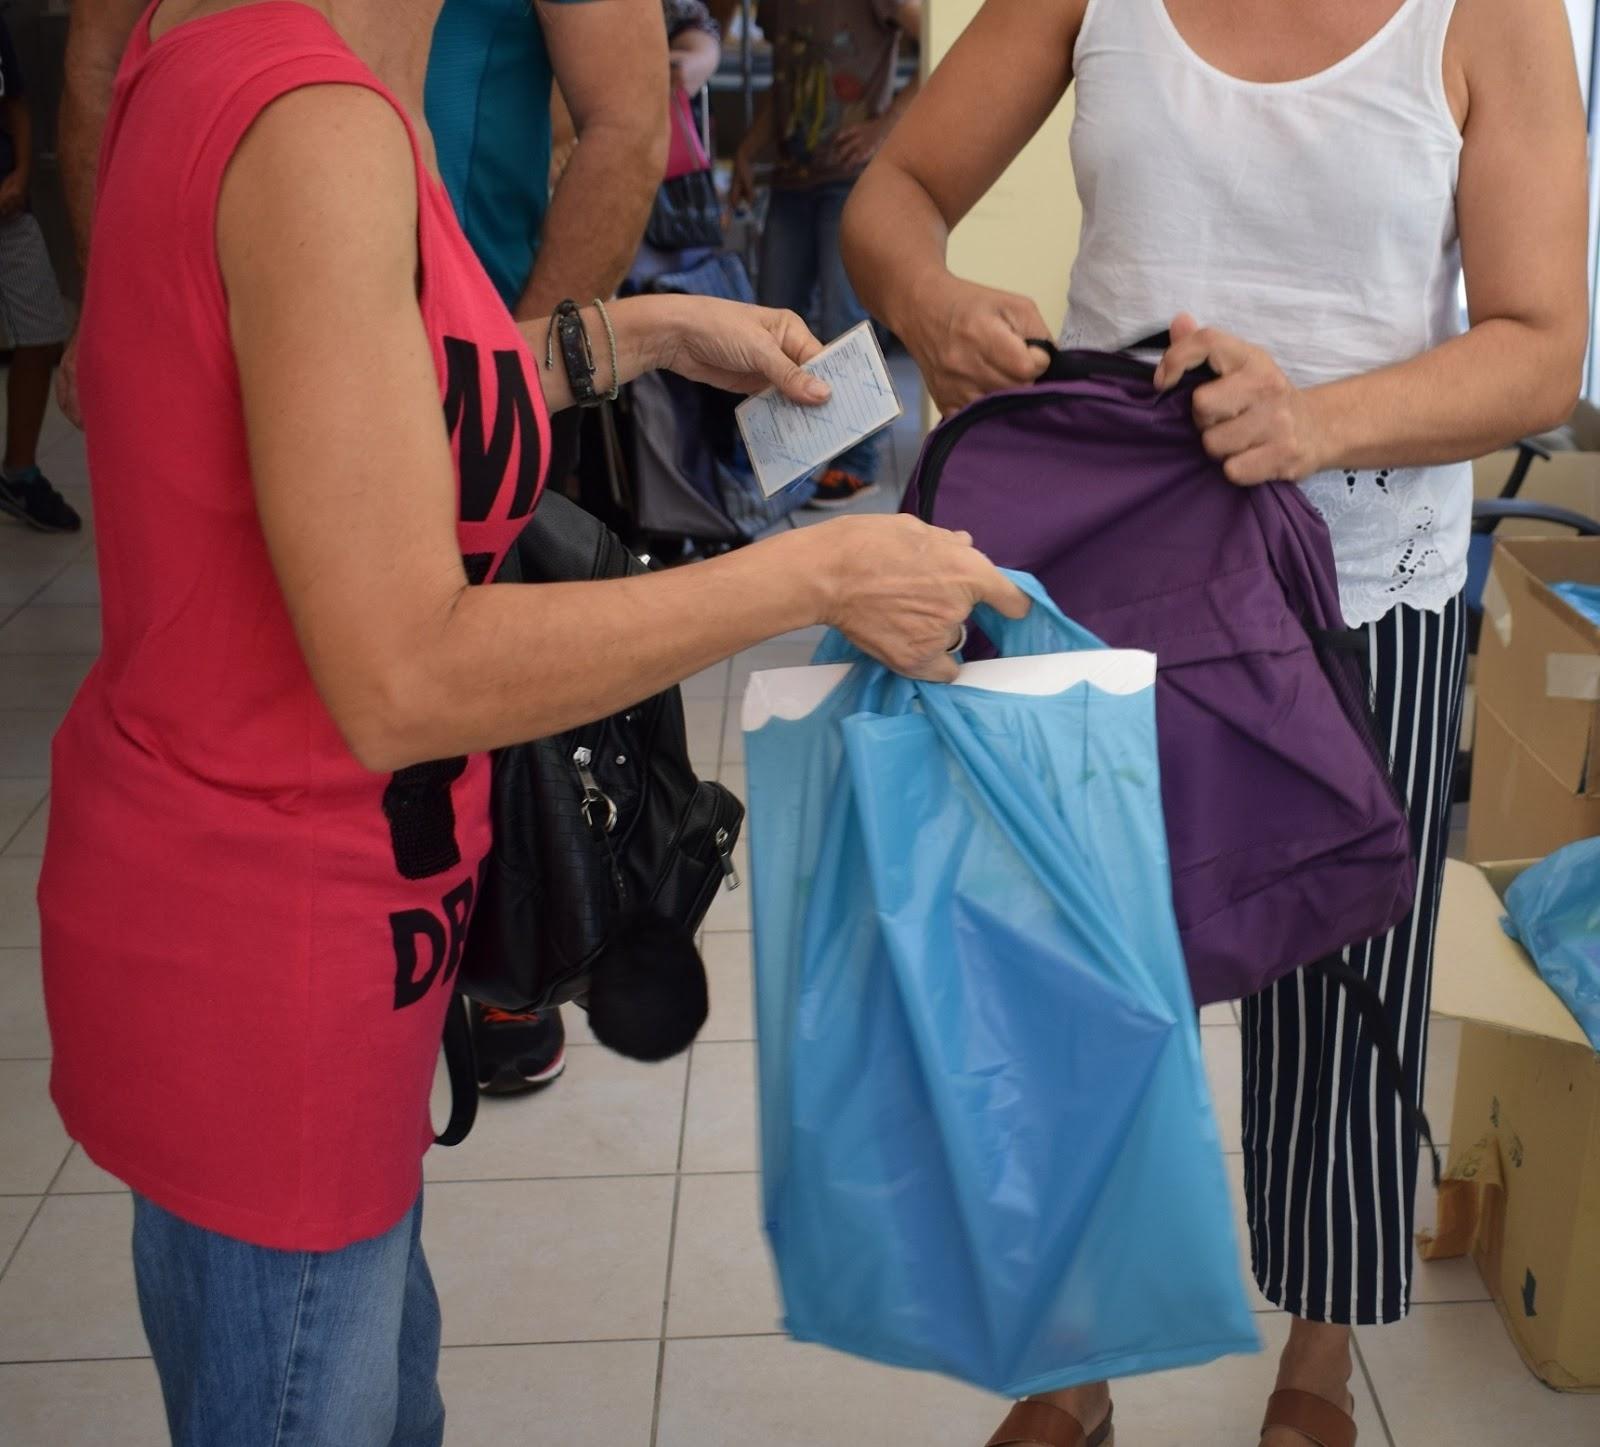 db6e326b26 Τσάντες και σχολικά είδη διέθεσε ο Δήμος Ιλίου σε πιστοποιημένους  δικαιούχους των Προγραμμάτων Κοινωνικής Προστασίας